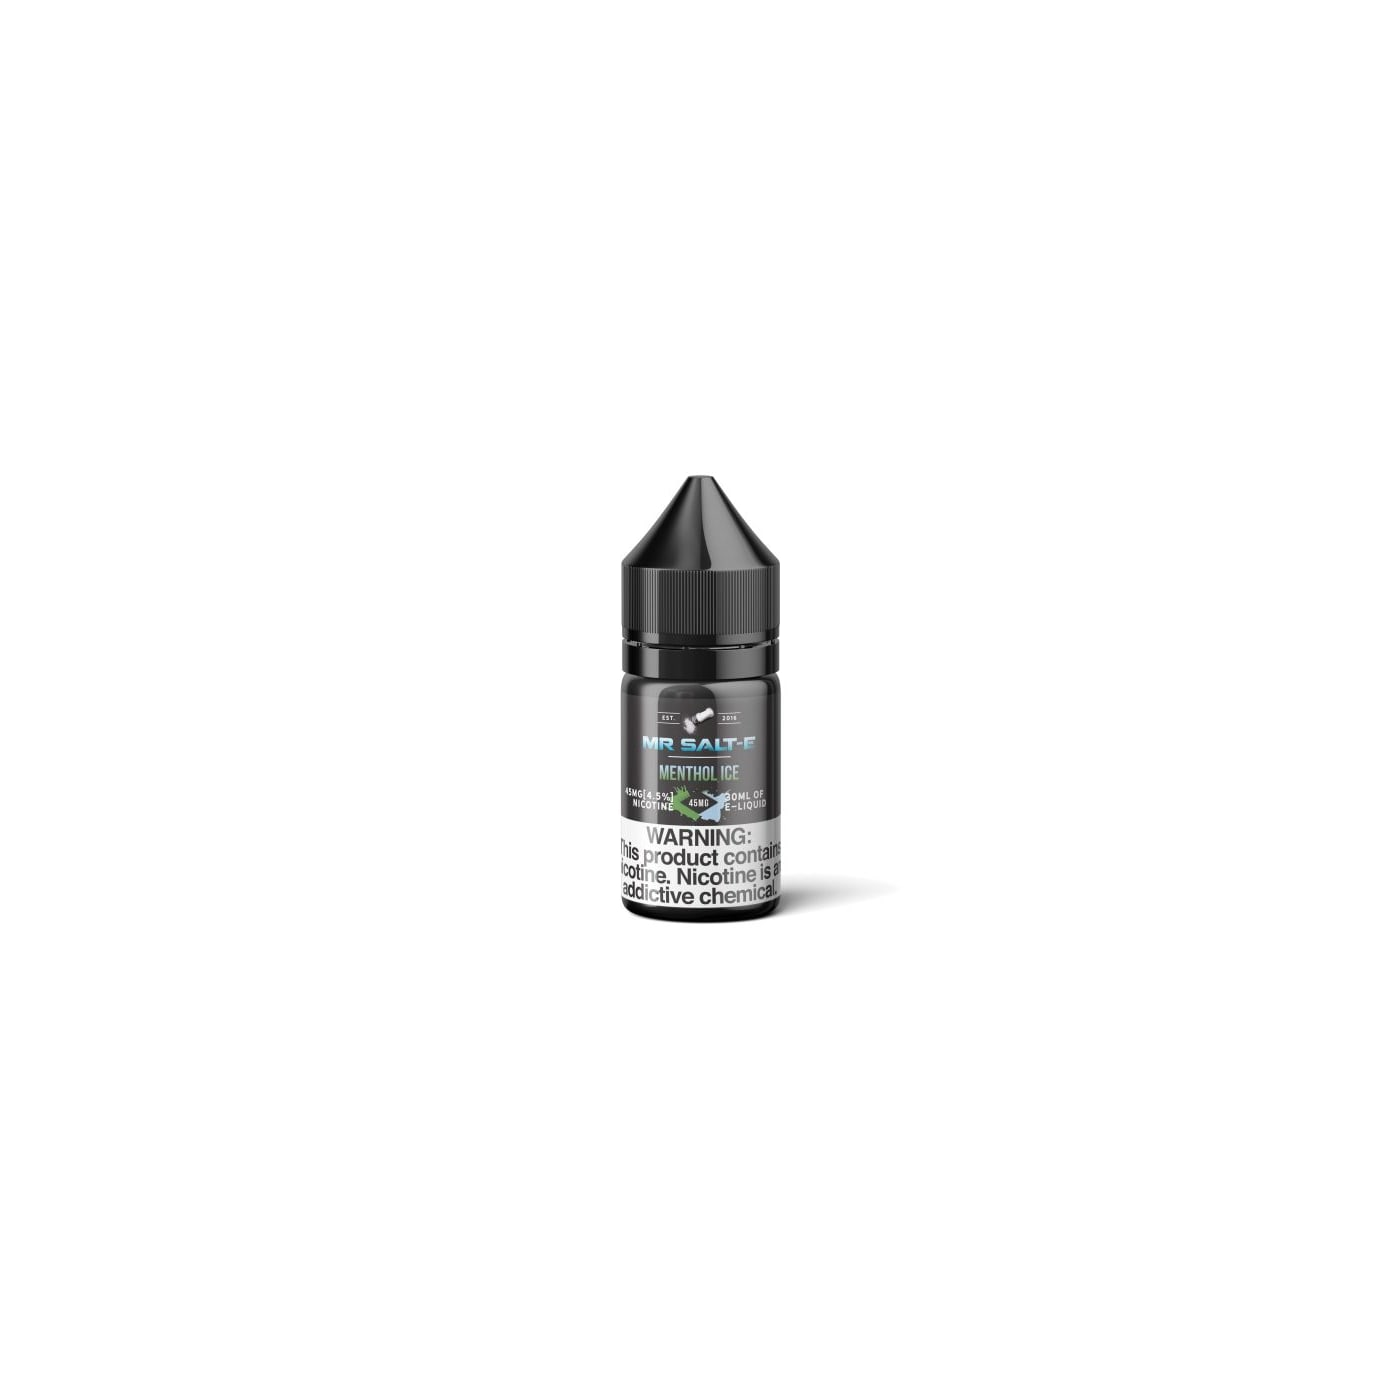 Menthol Ice 30ml E-liquid by Mr. Salt-E